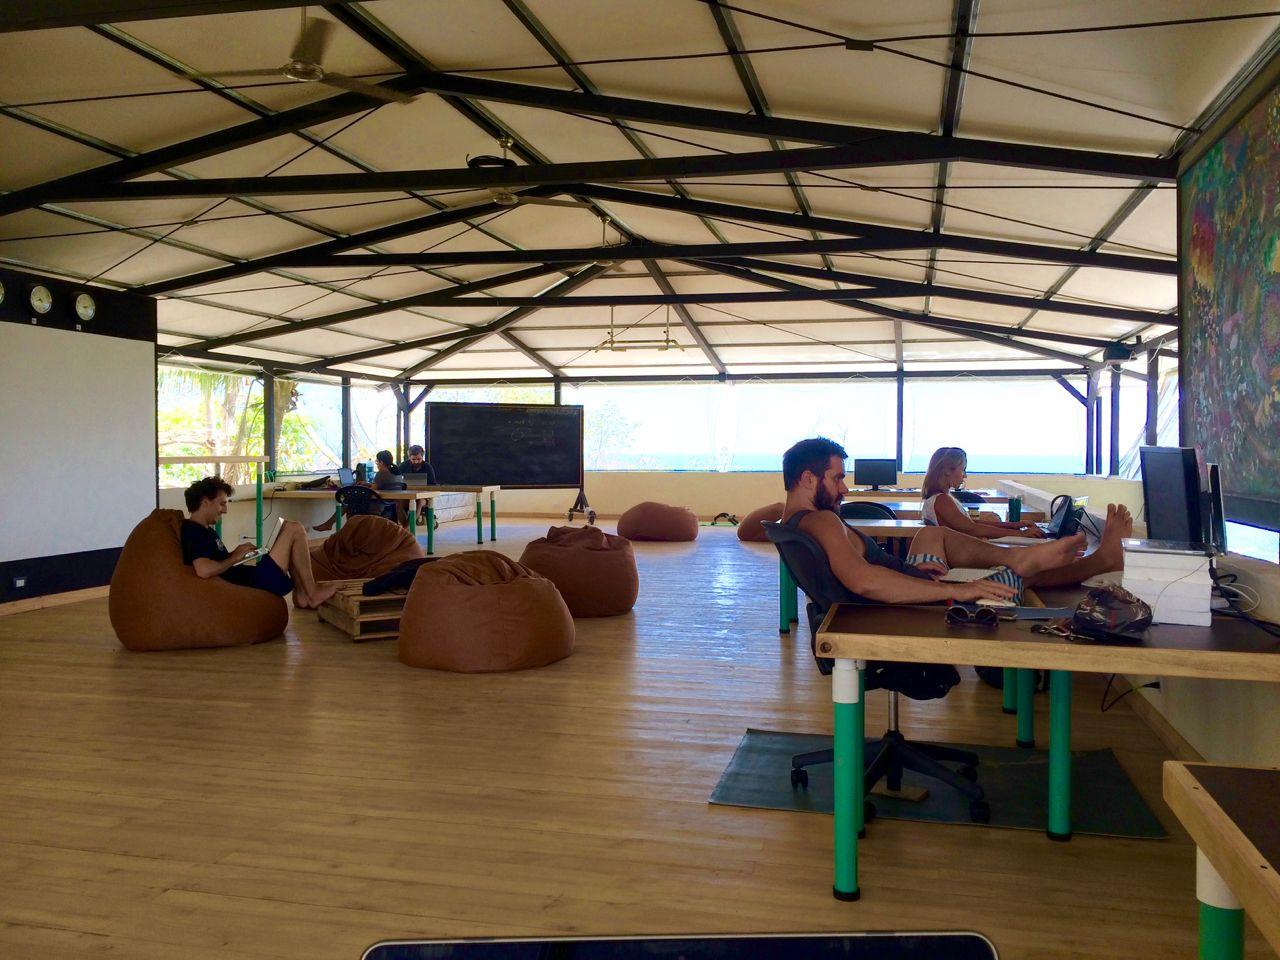 SkyLoft - Coworking in Paradise, Santa Teresa